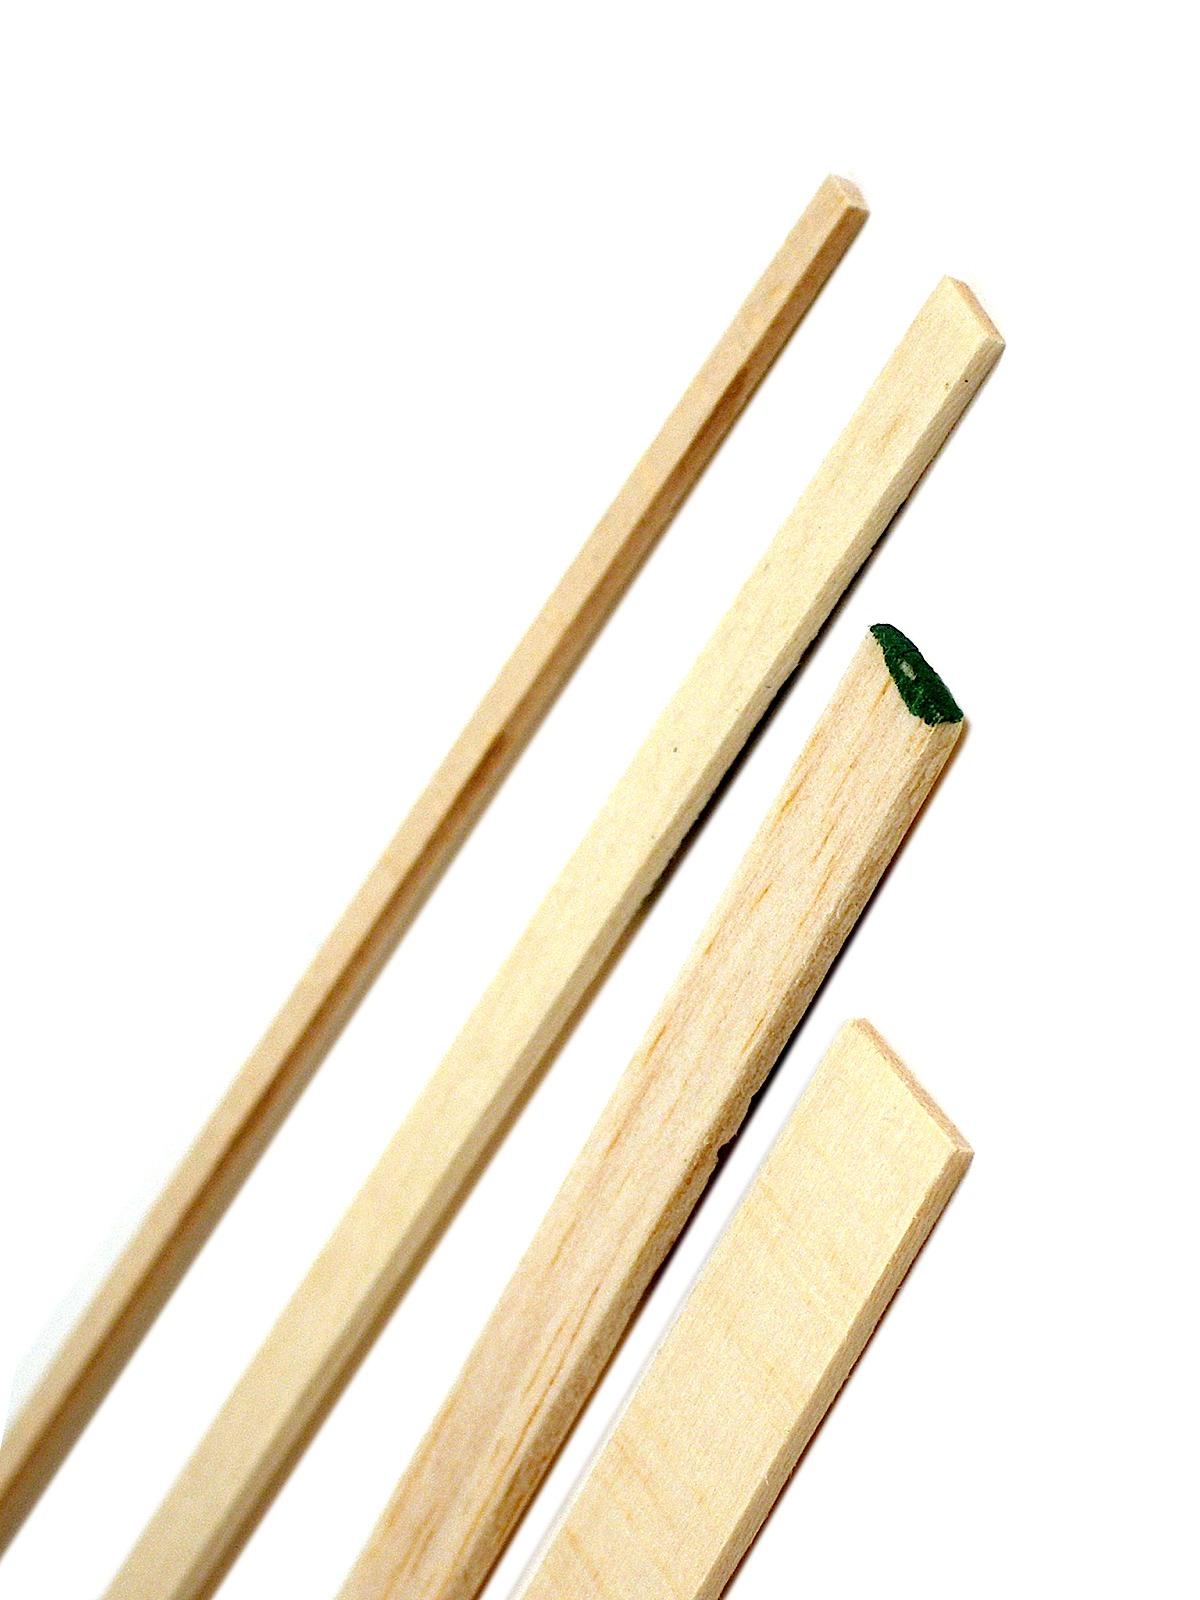 Midwest - Basswood Sticks